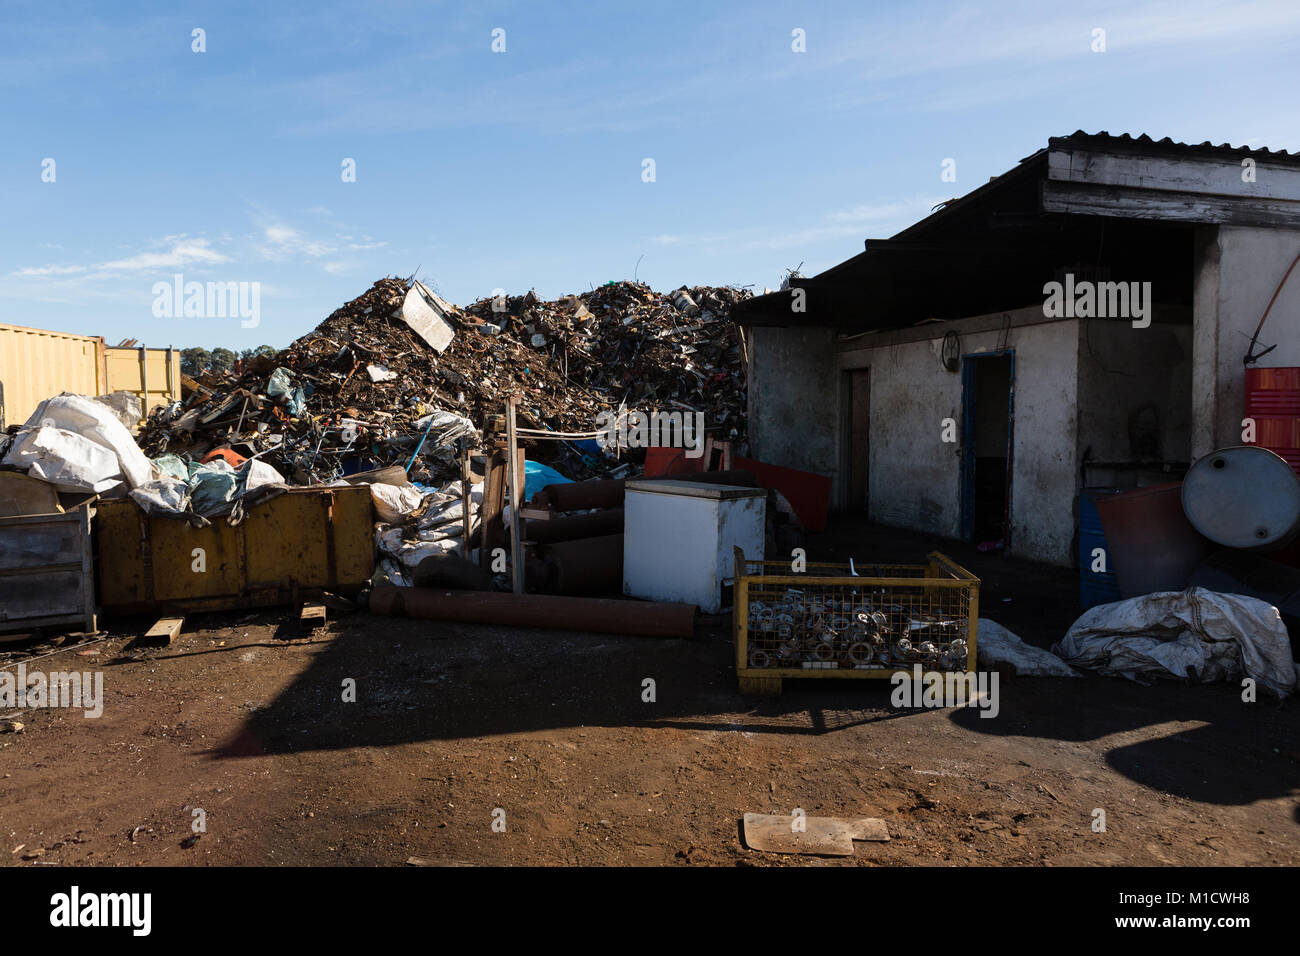 Heap of trash in the junkyard - Stock Image